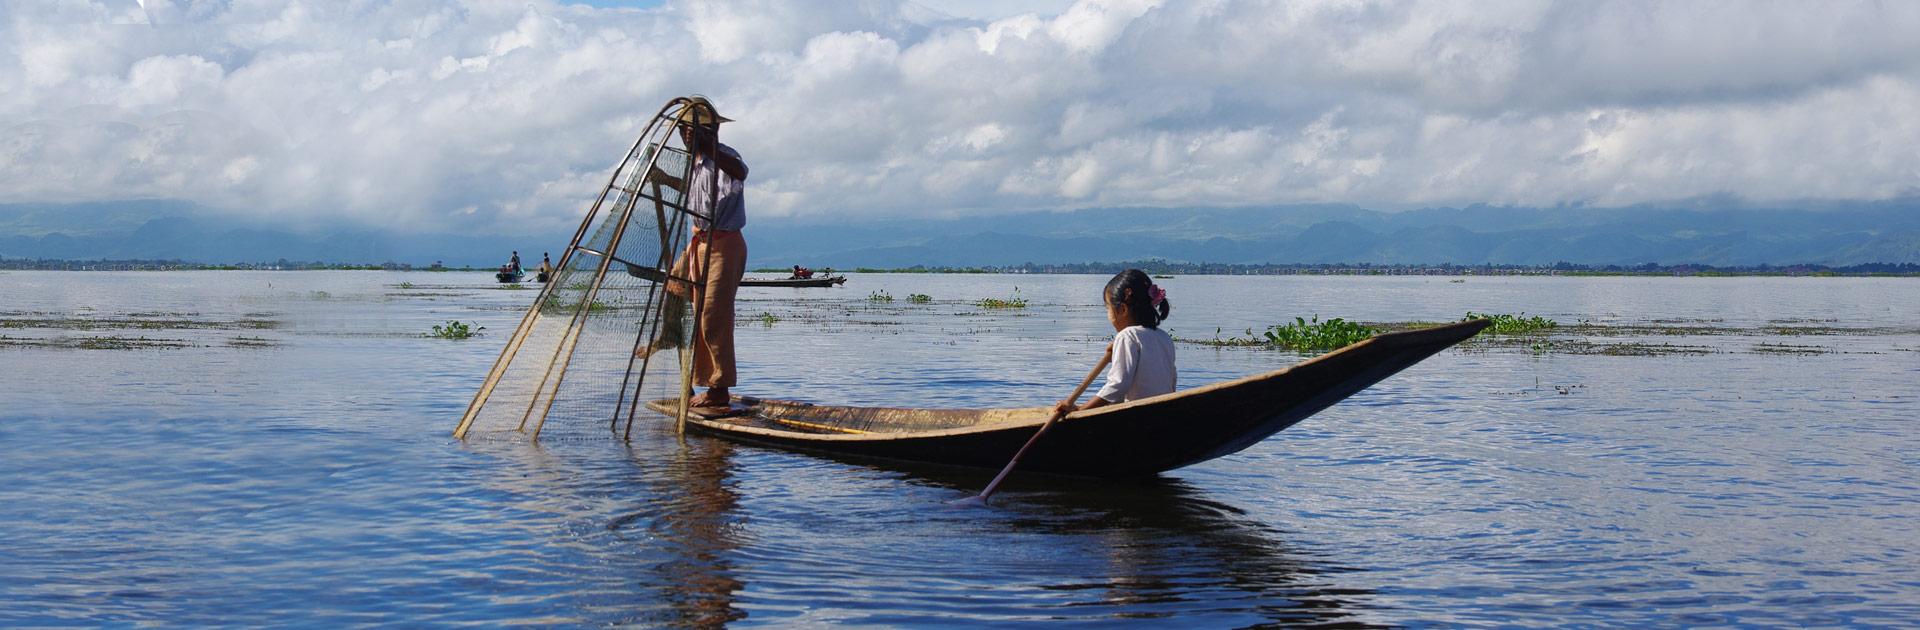 KHMM Myanmar Básico y Angkor 13 días 4 pg